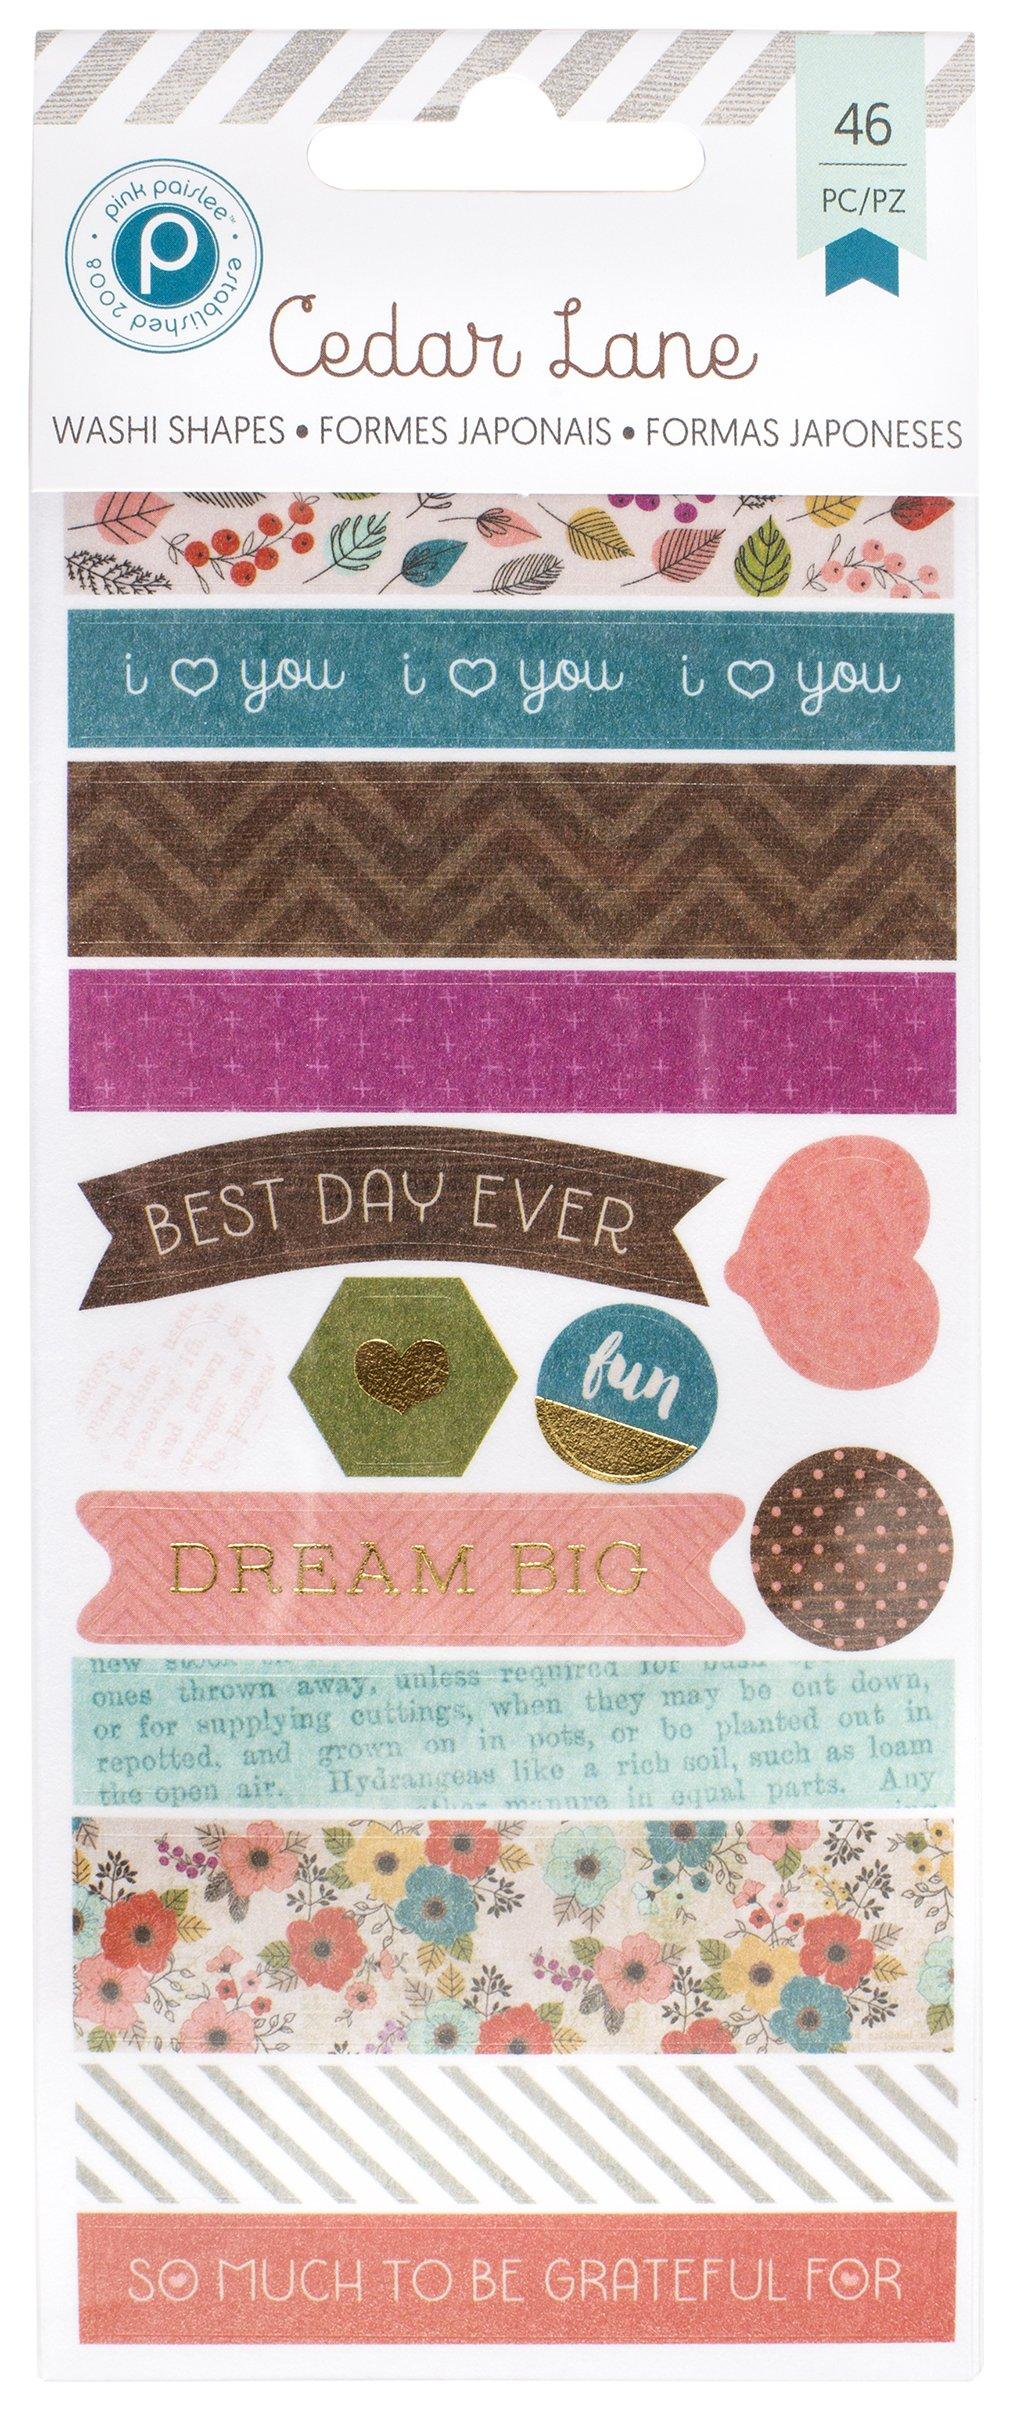 American Crafts 46 Piece Paislee 3 Sheets Cedar Lane Foil Washi Book Tape, Gold/Pink